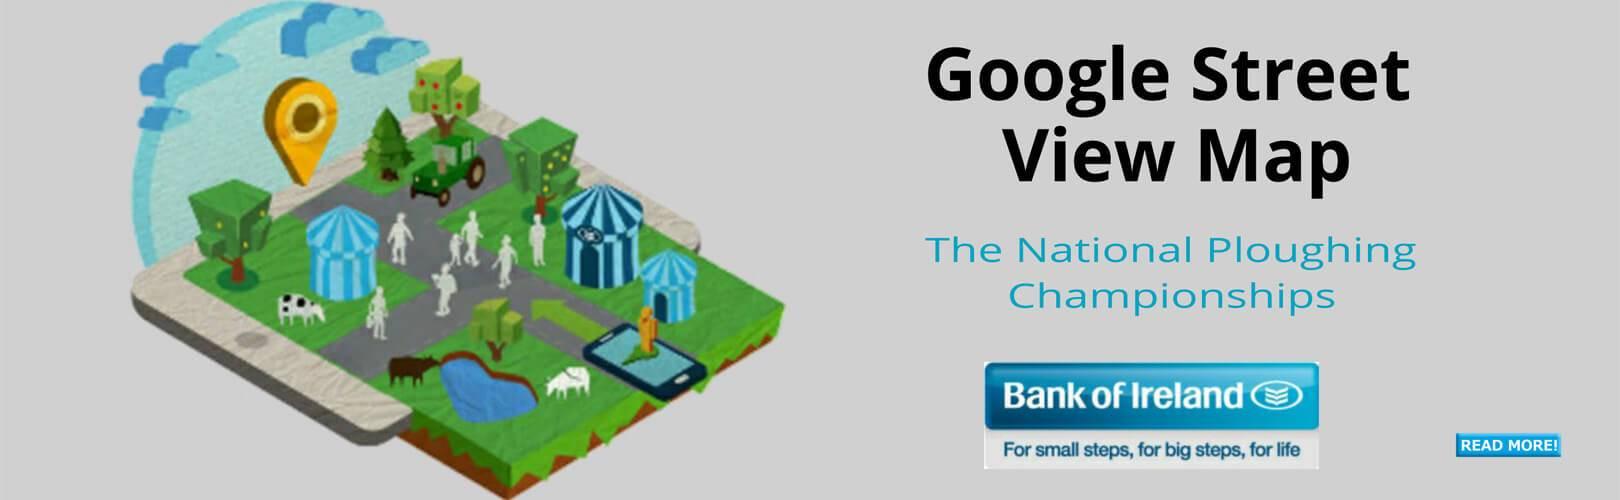 Bank-of-Ireland-Ploughing-Google-Maps-Virtual-Tour-V5-1620x500